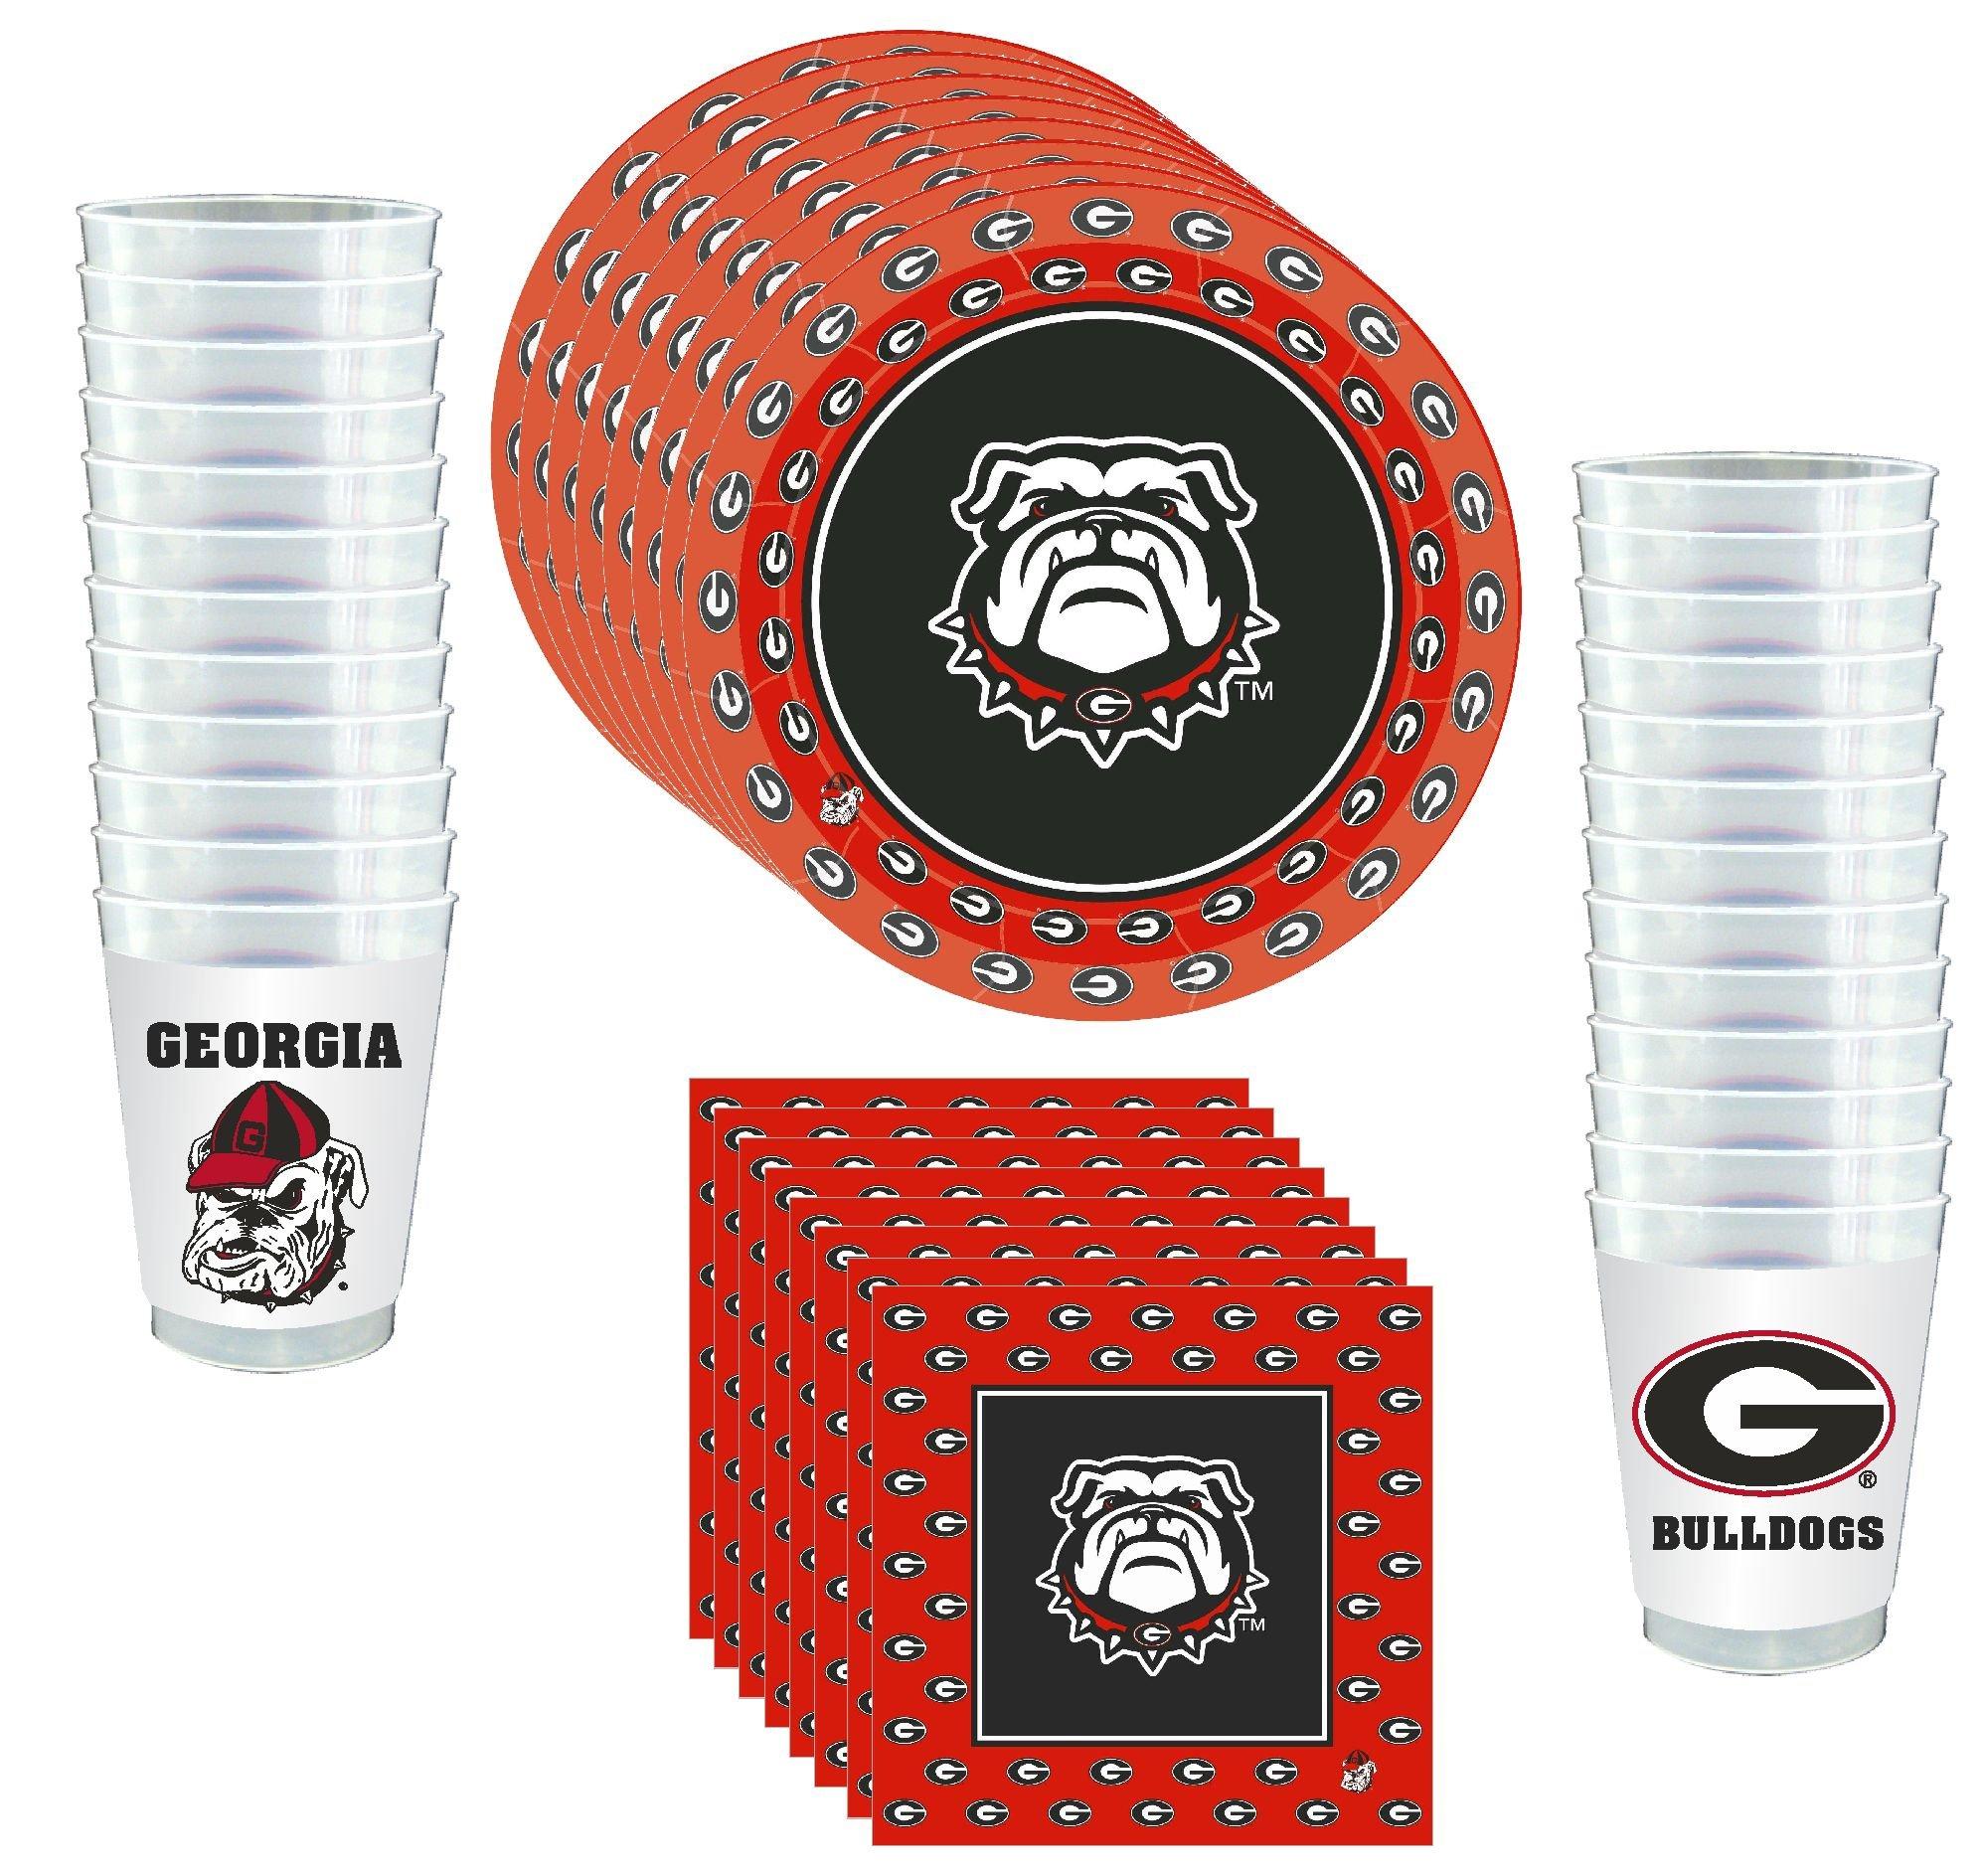 Westrick Georgia Bulldogs Party Supplies 81 Pieces